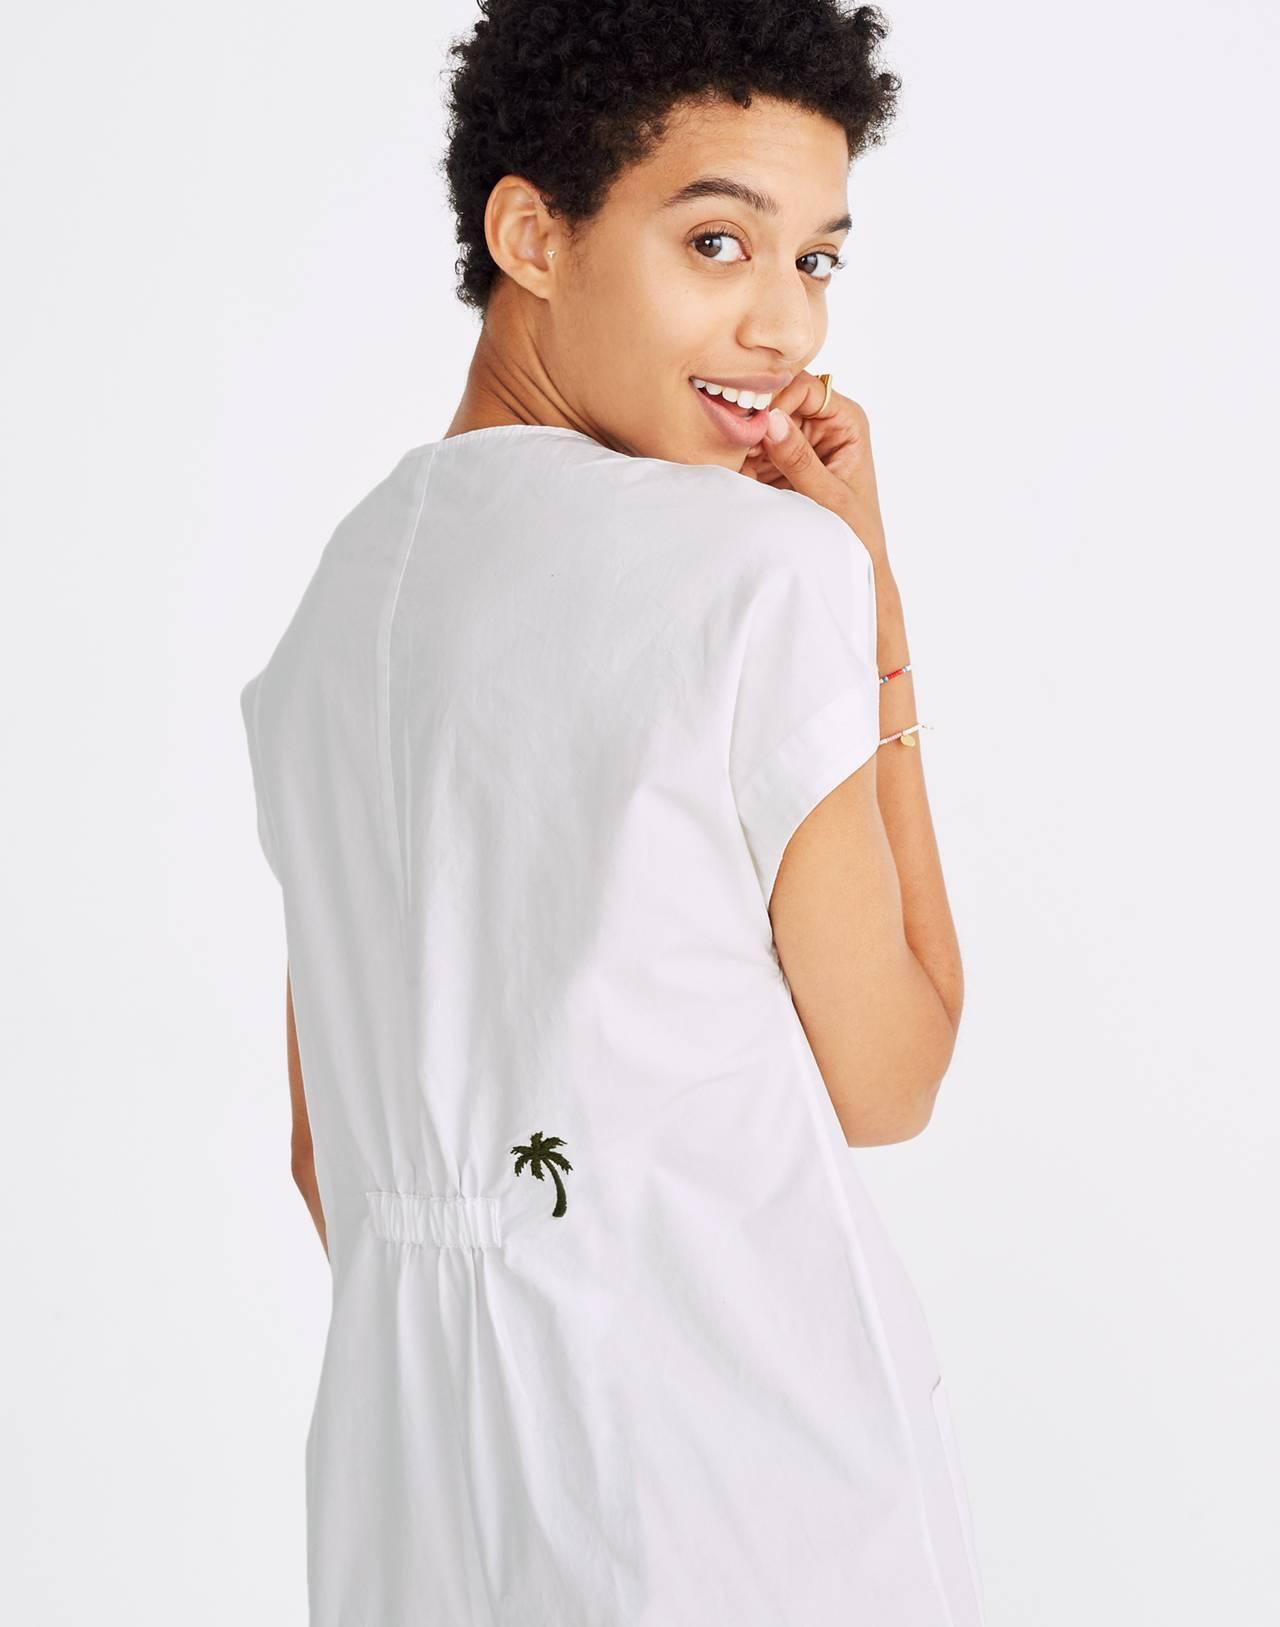 Mosswood Jumpsuit in eyelet white image 2